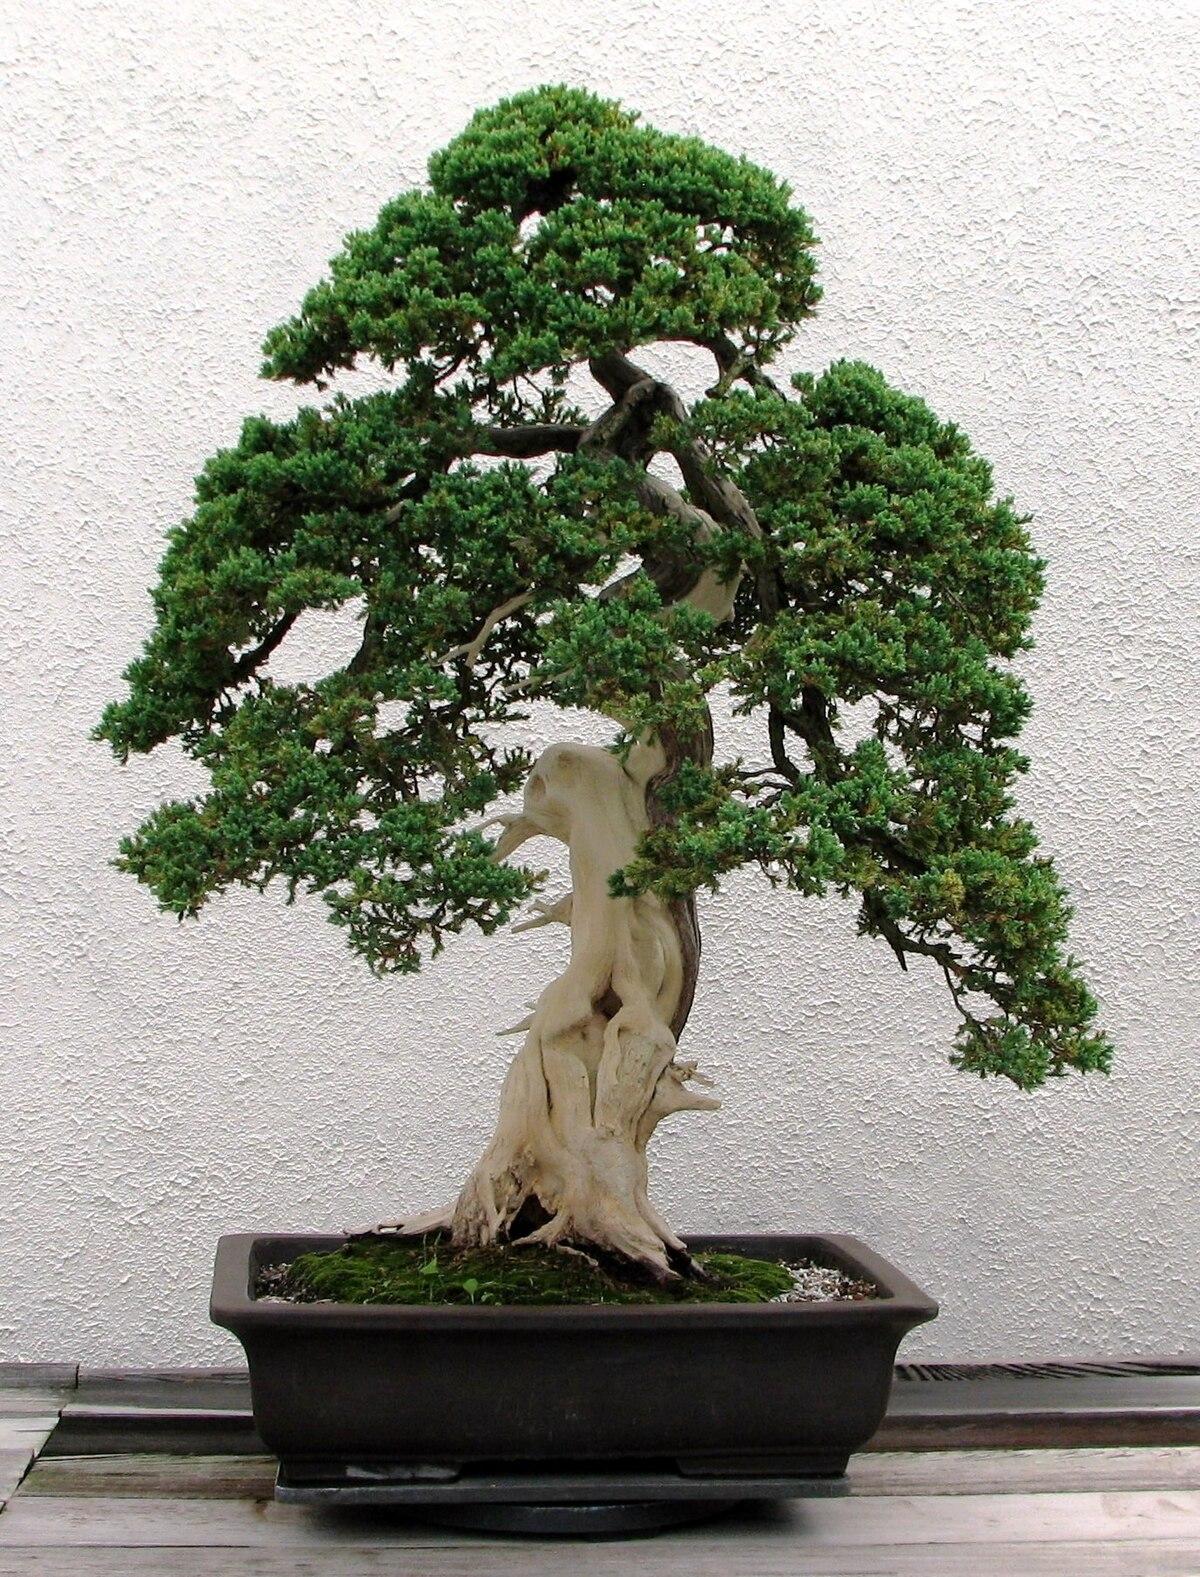 Deadwood Bonsai Techniques Wikipedia